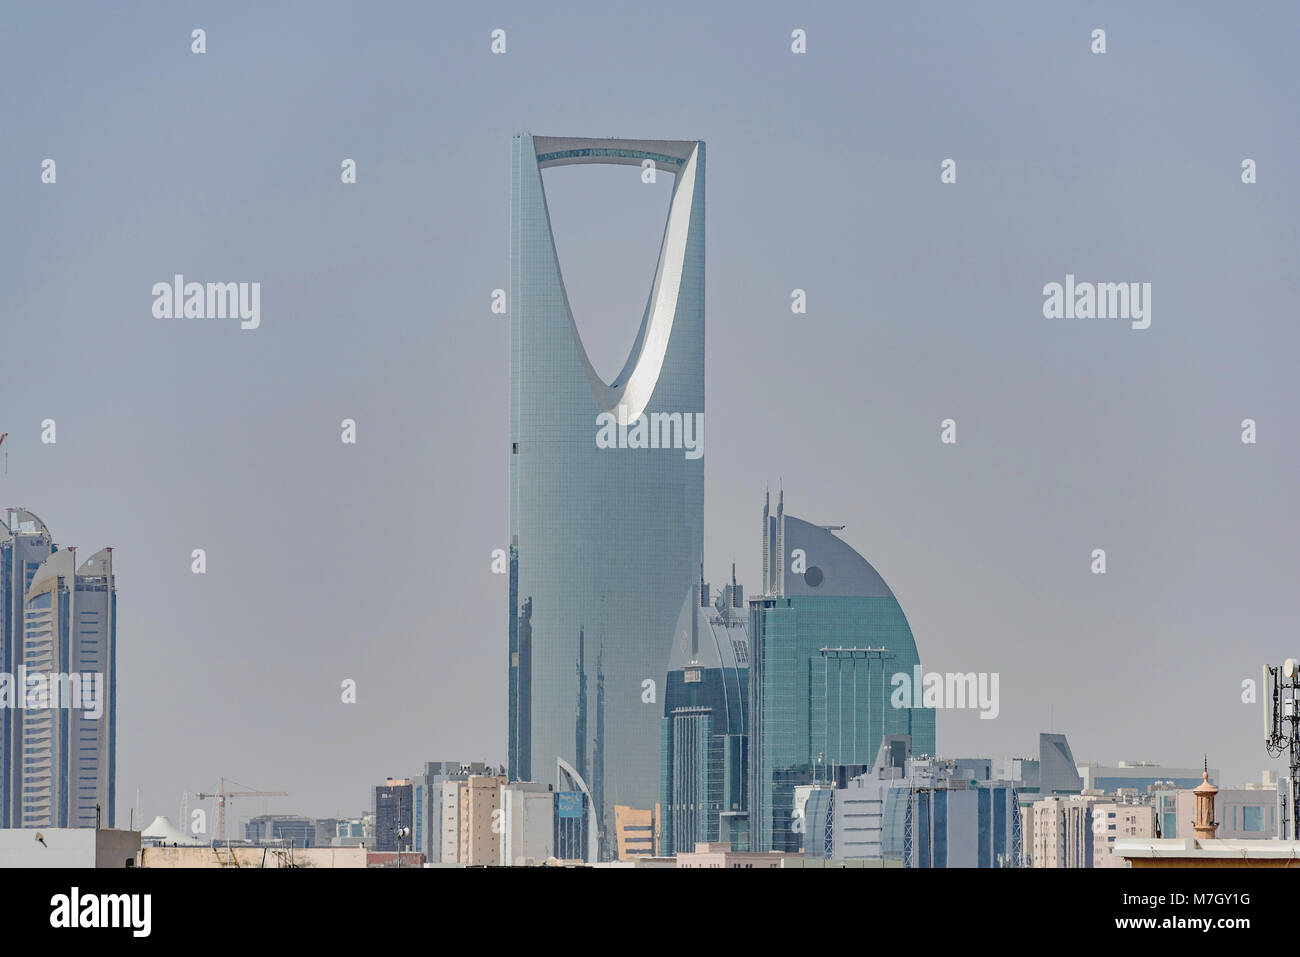 Riyadh buildings and partial skyline. - Stock Image